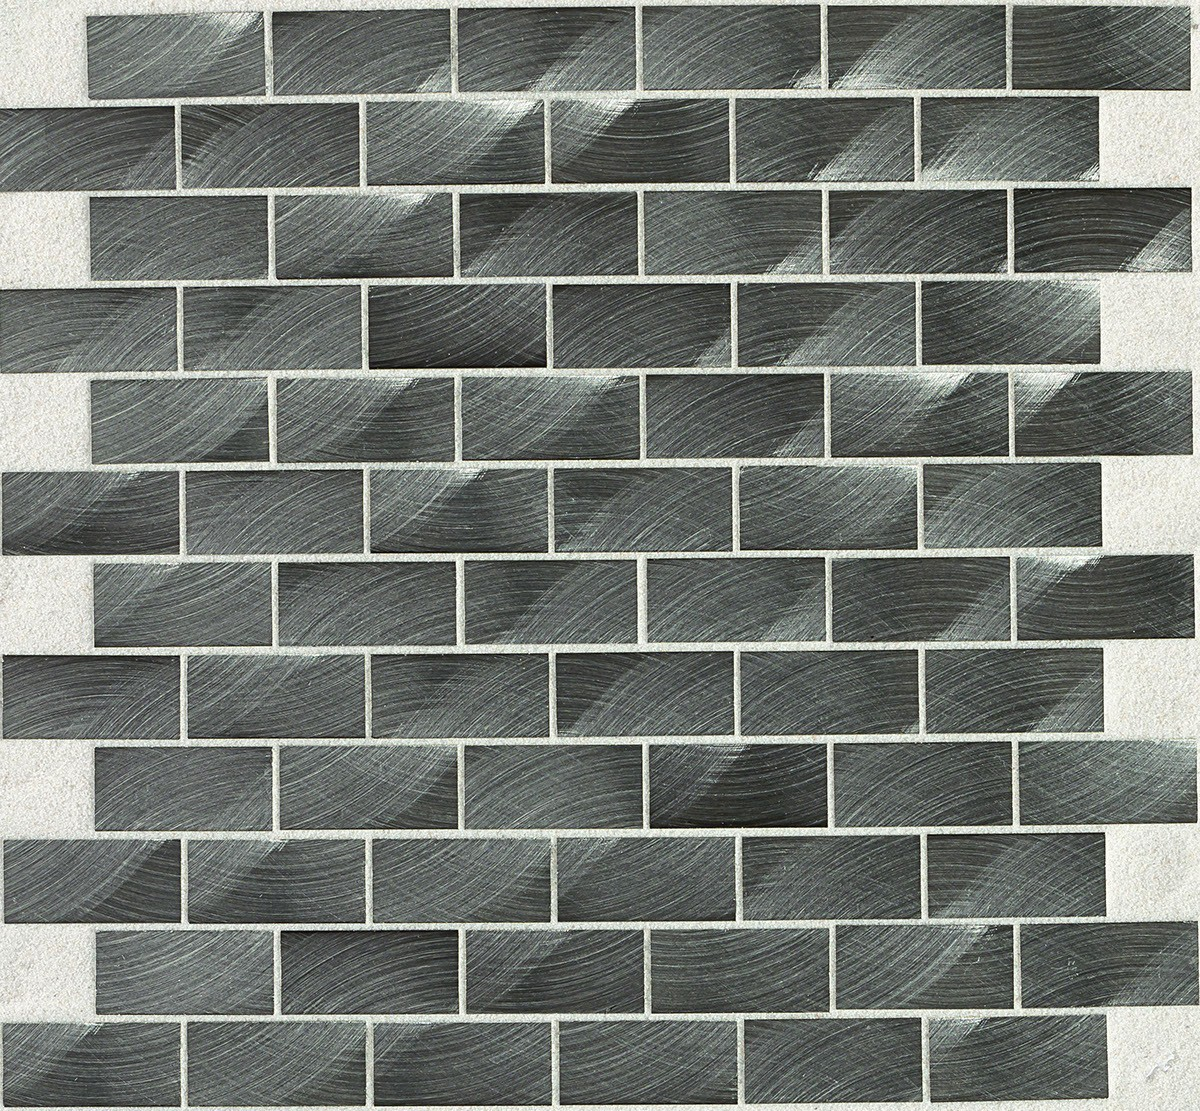 ST72 Gunmetal Mosaic brick joint